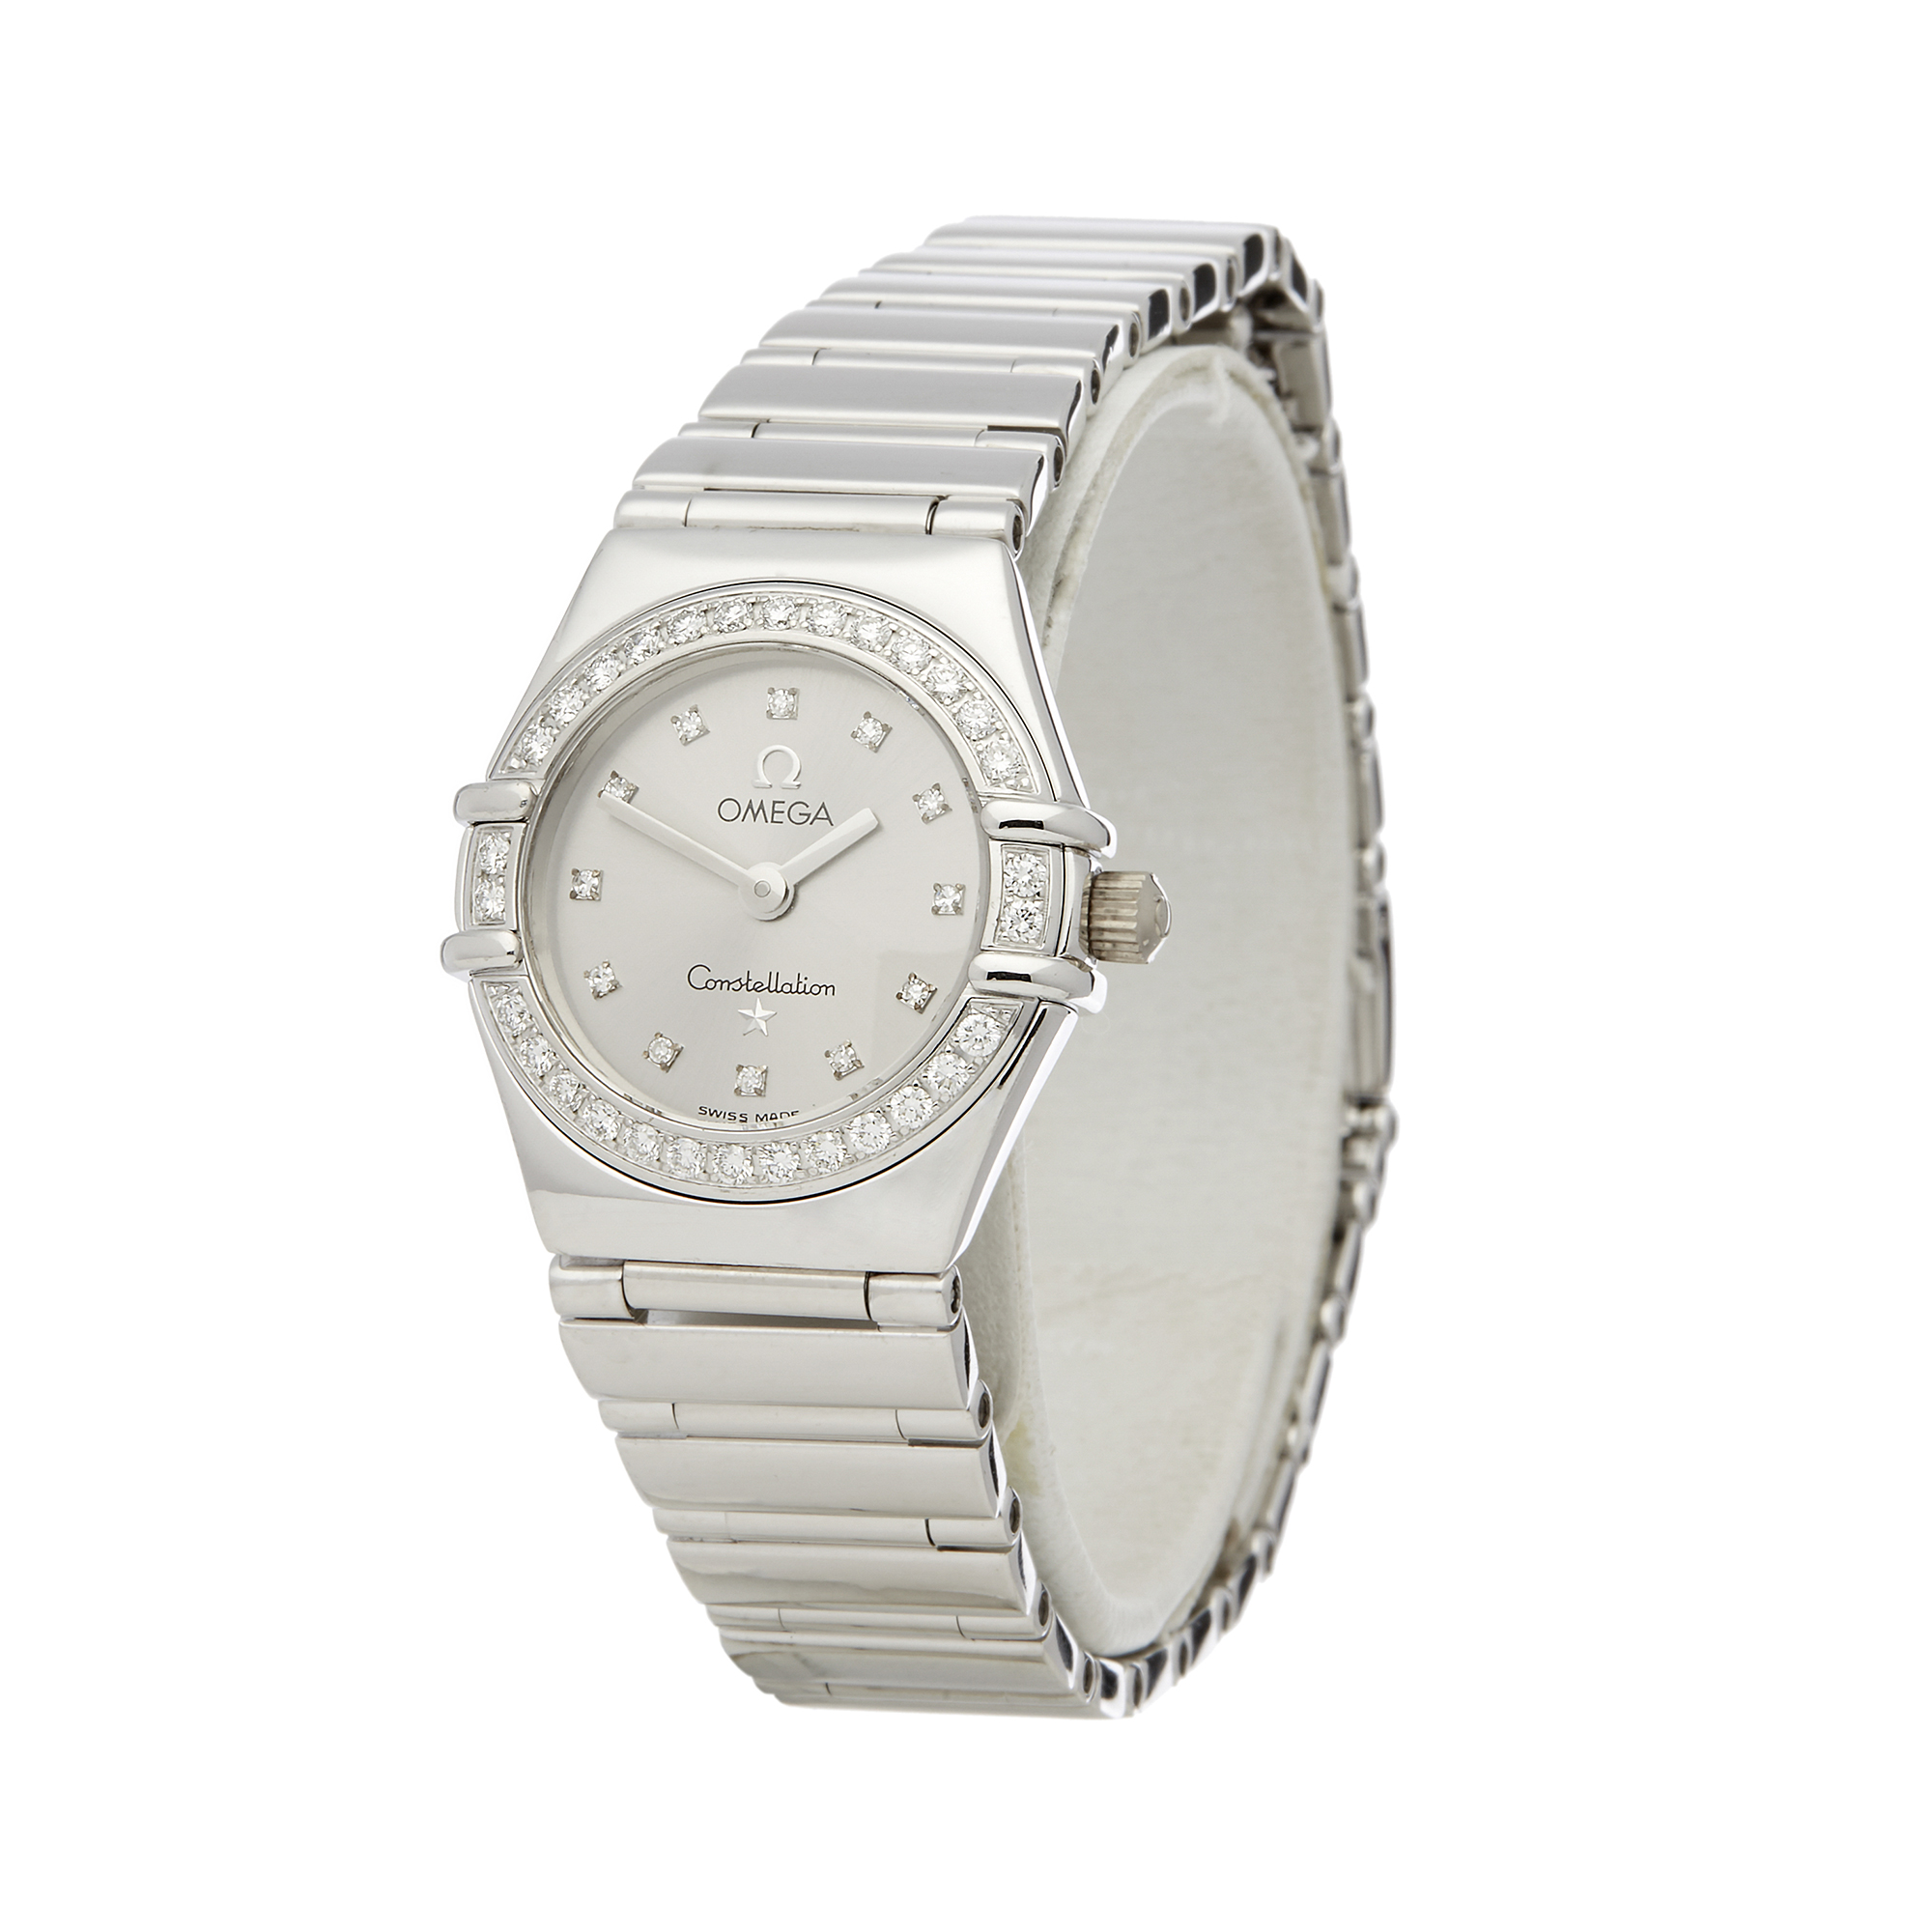 Omega Constellation 0 1165.36 Ladies White Gold Diamond Watch